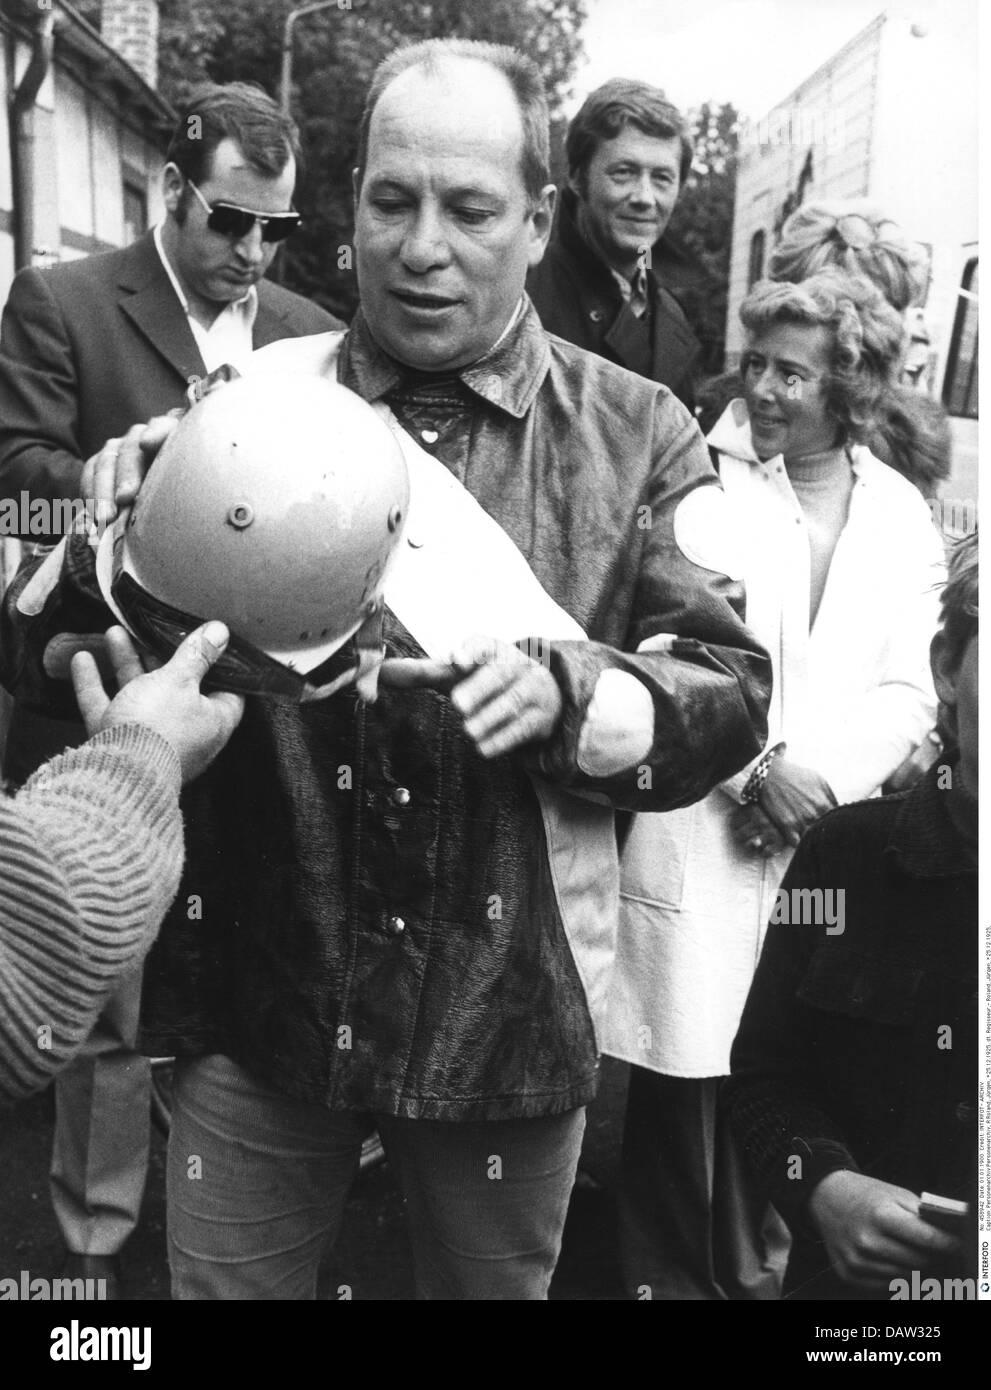 Roland, Juergen, 25.12.1925 - 21.9.2007, German director, half length, at celebrity trotting race, Hamburg, 1972, - Stock Image